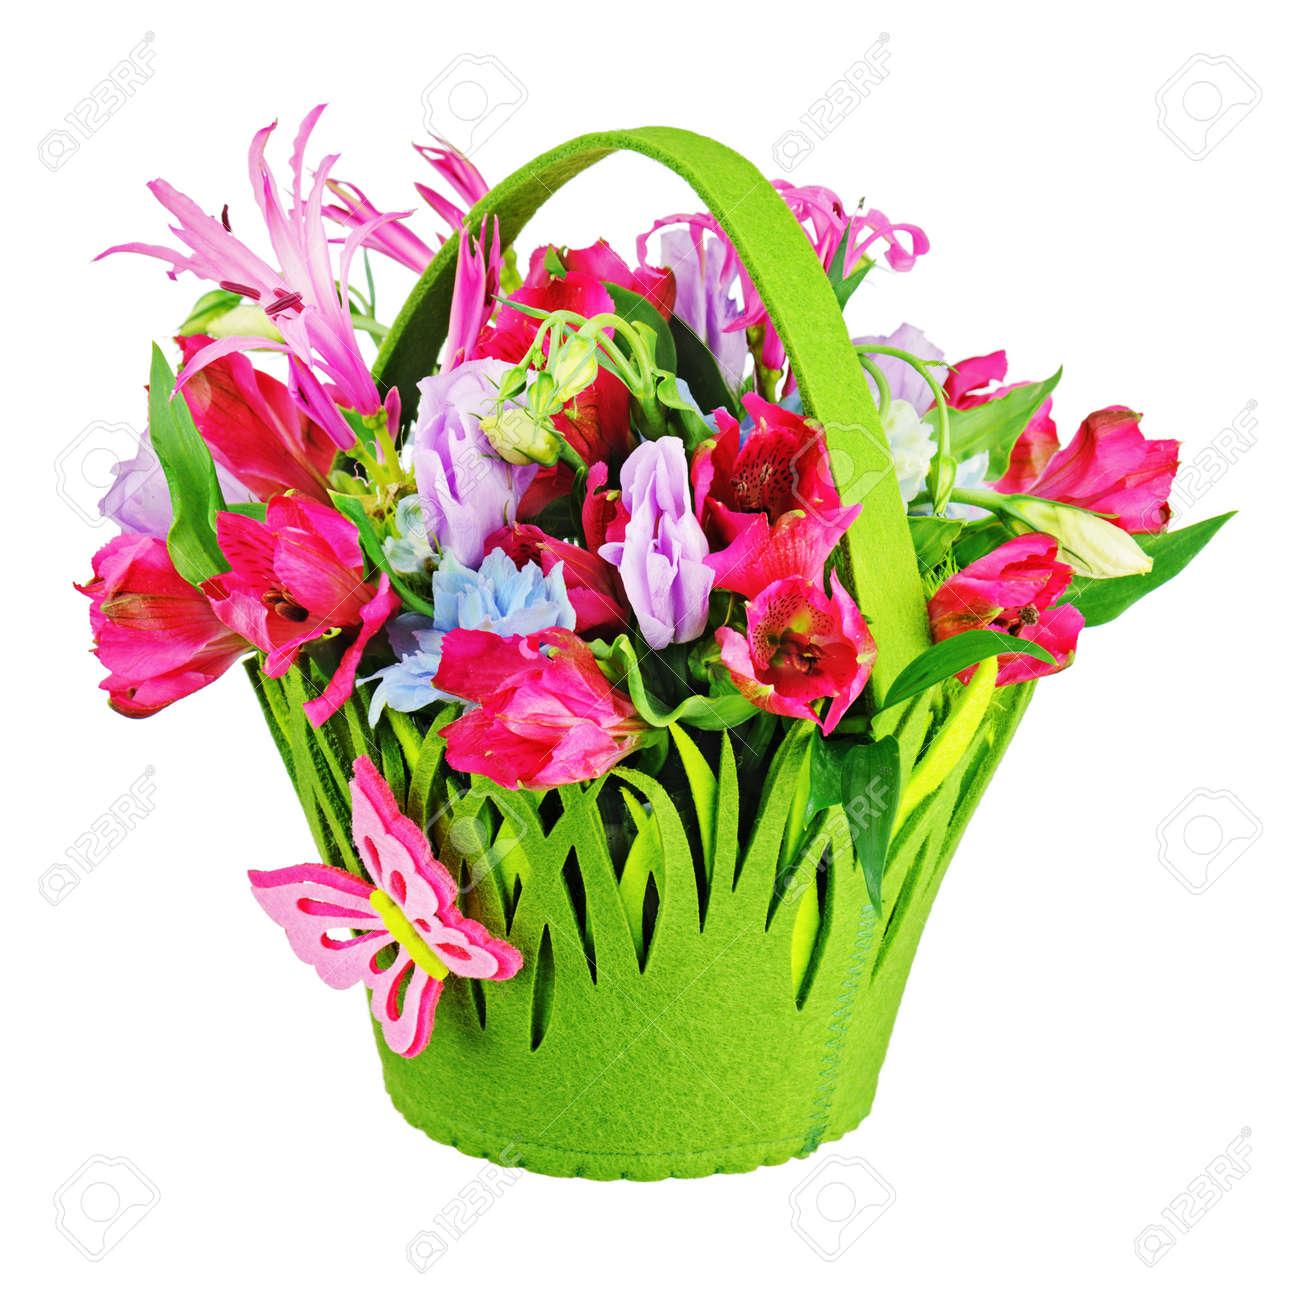 Colorful Flower Bouquet Arrangement Centerpiece In Baby Basket